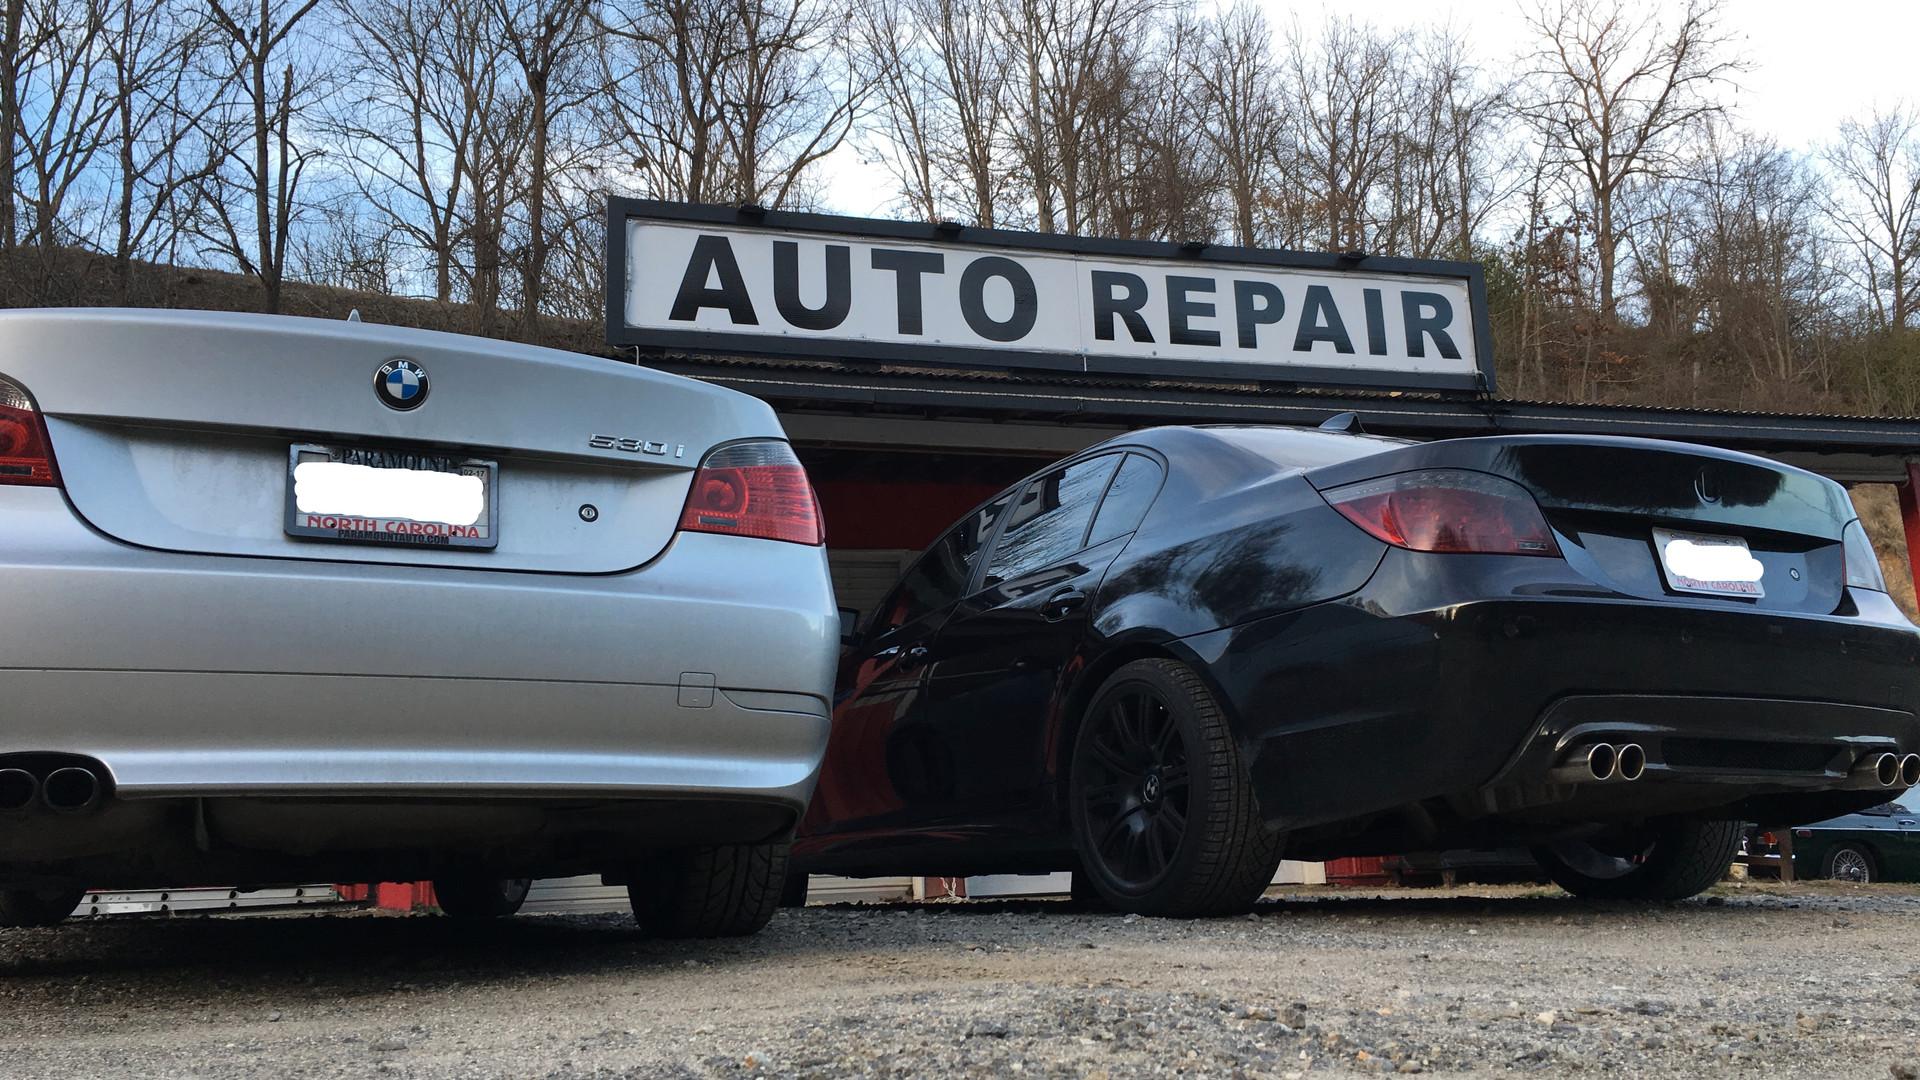 Empire Automotive Repair loves BMW's